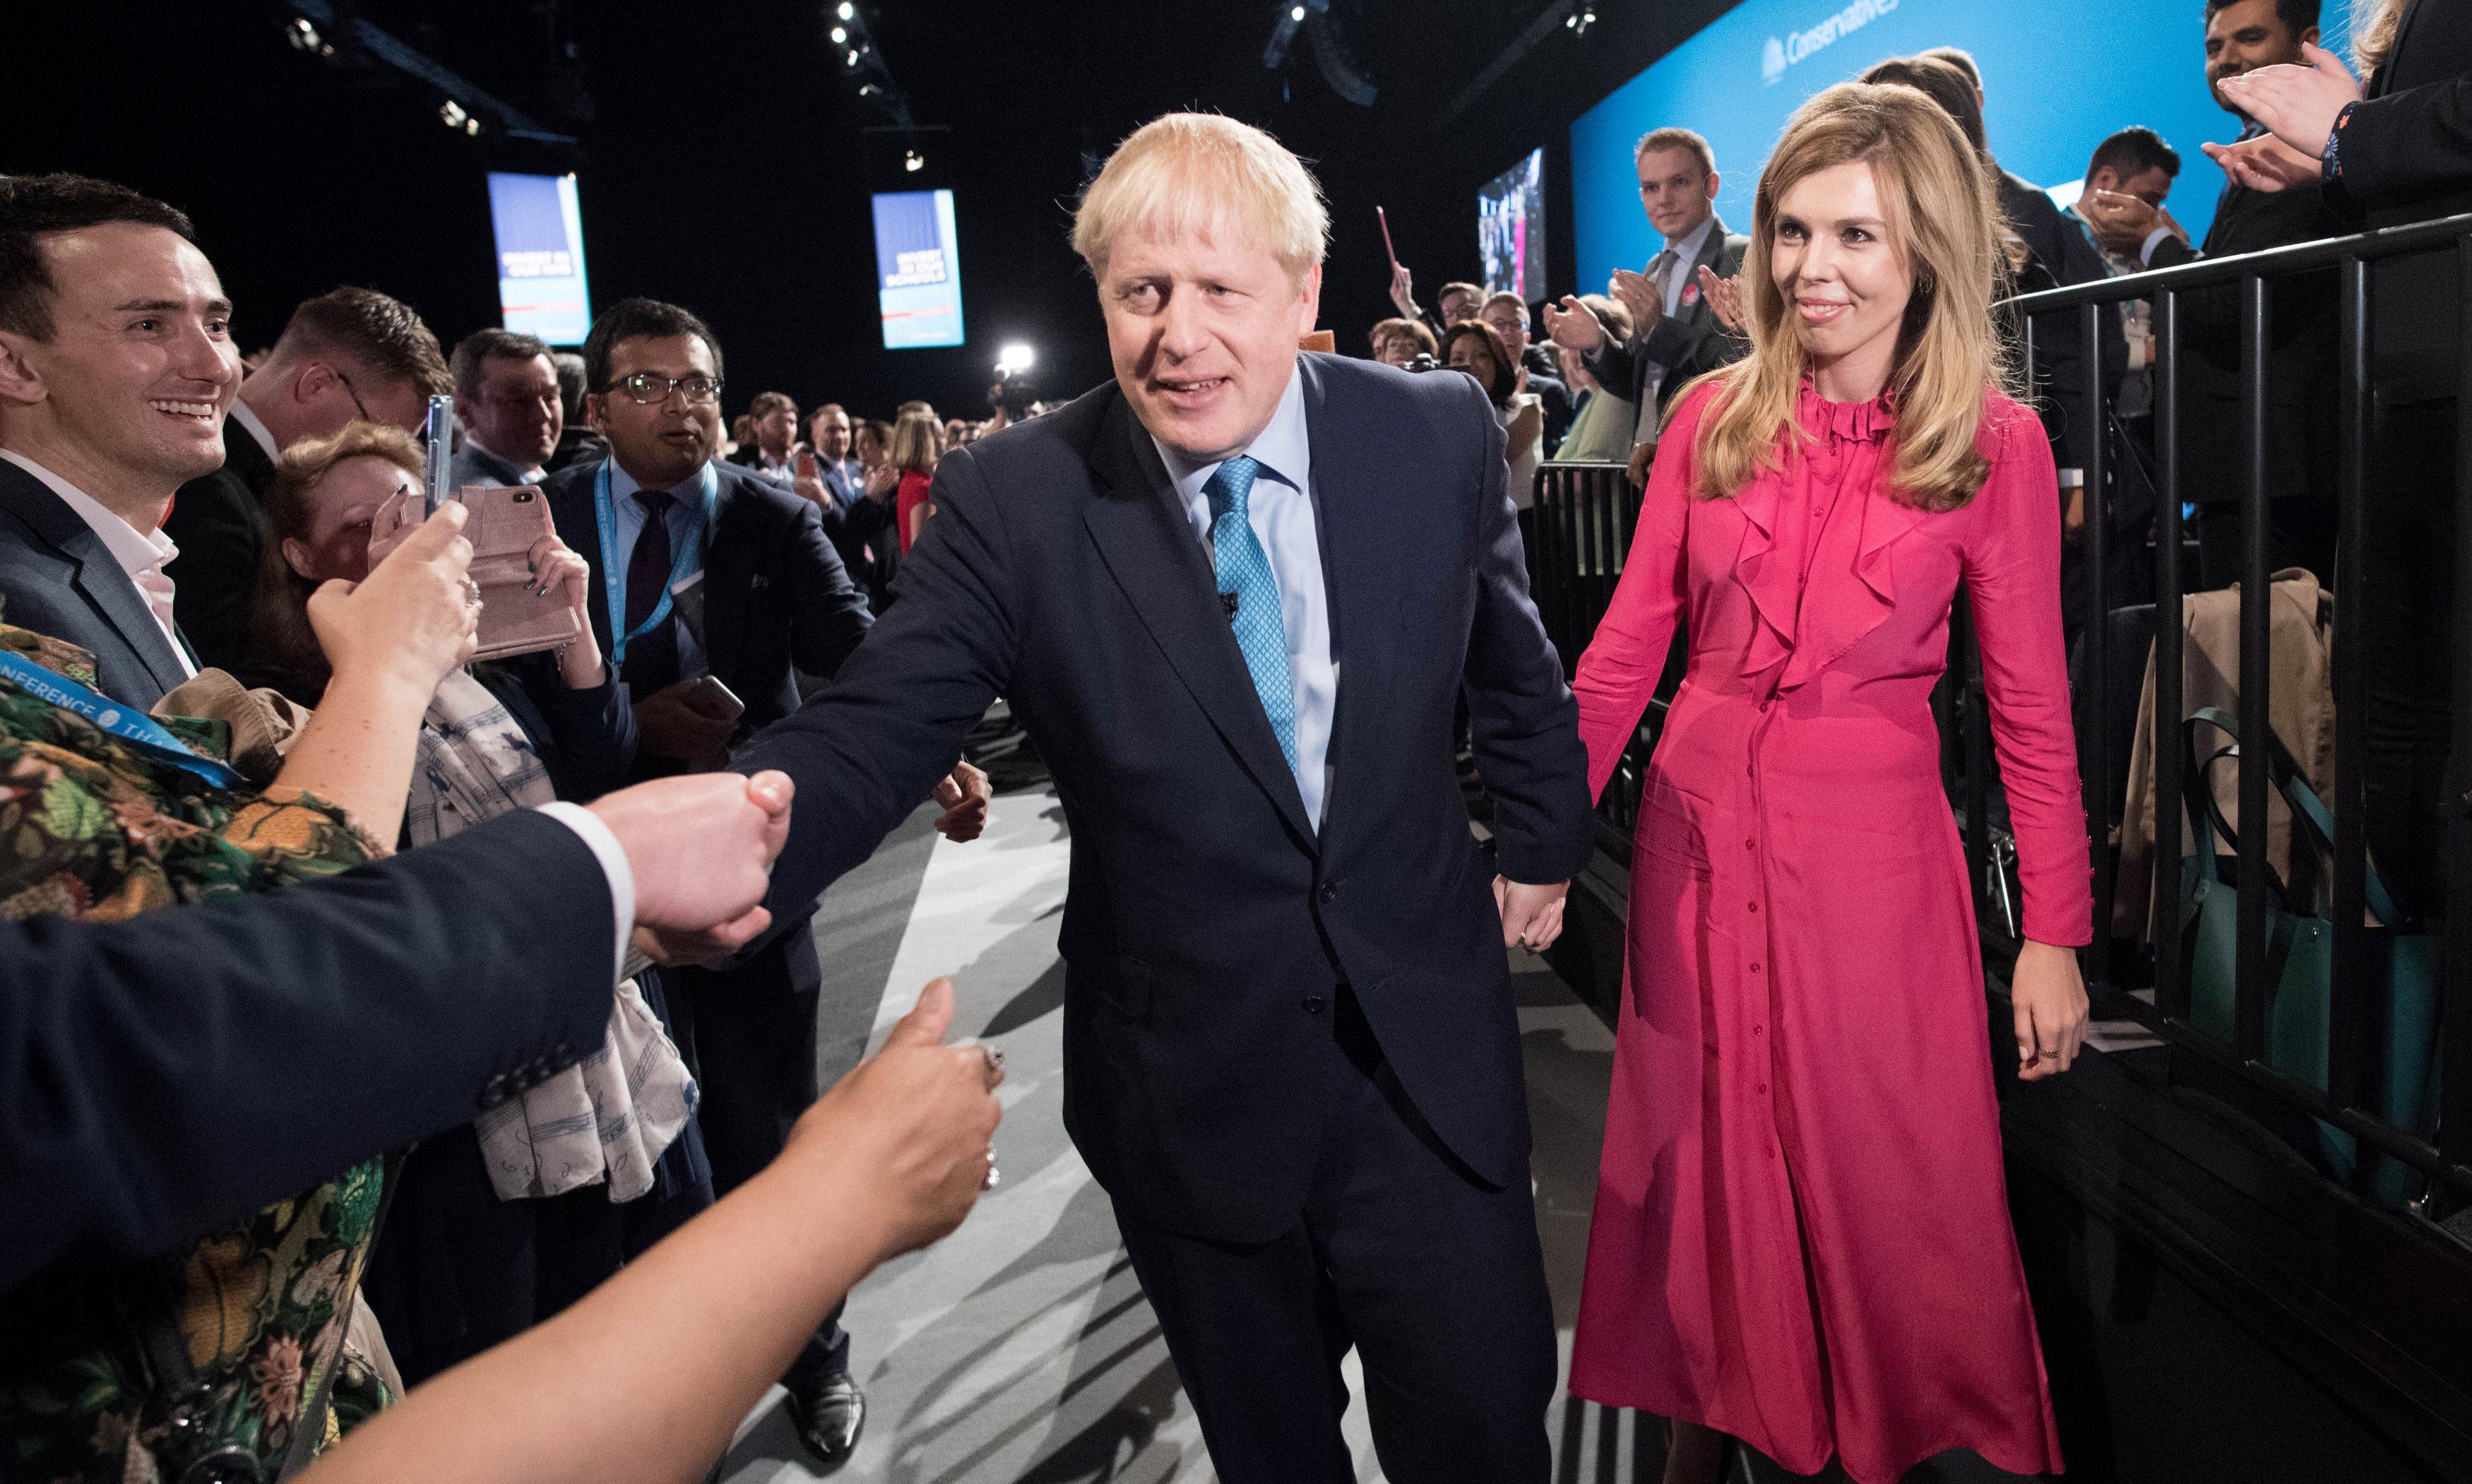 Thursday briefing: PM's plan faces euro scepticism